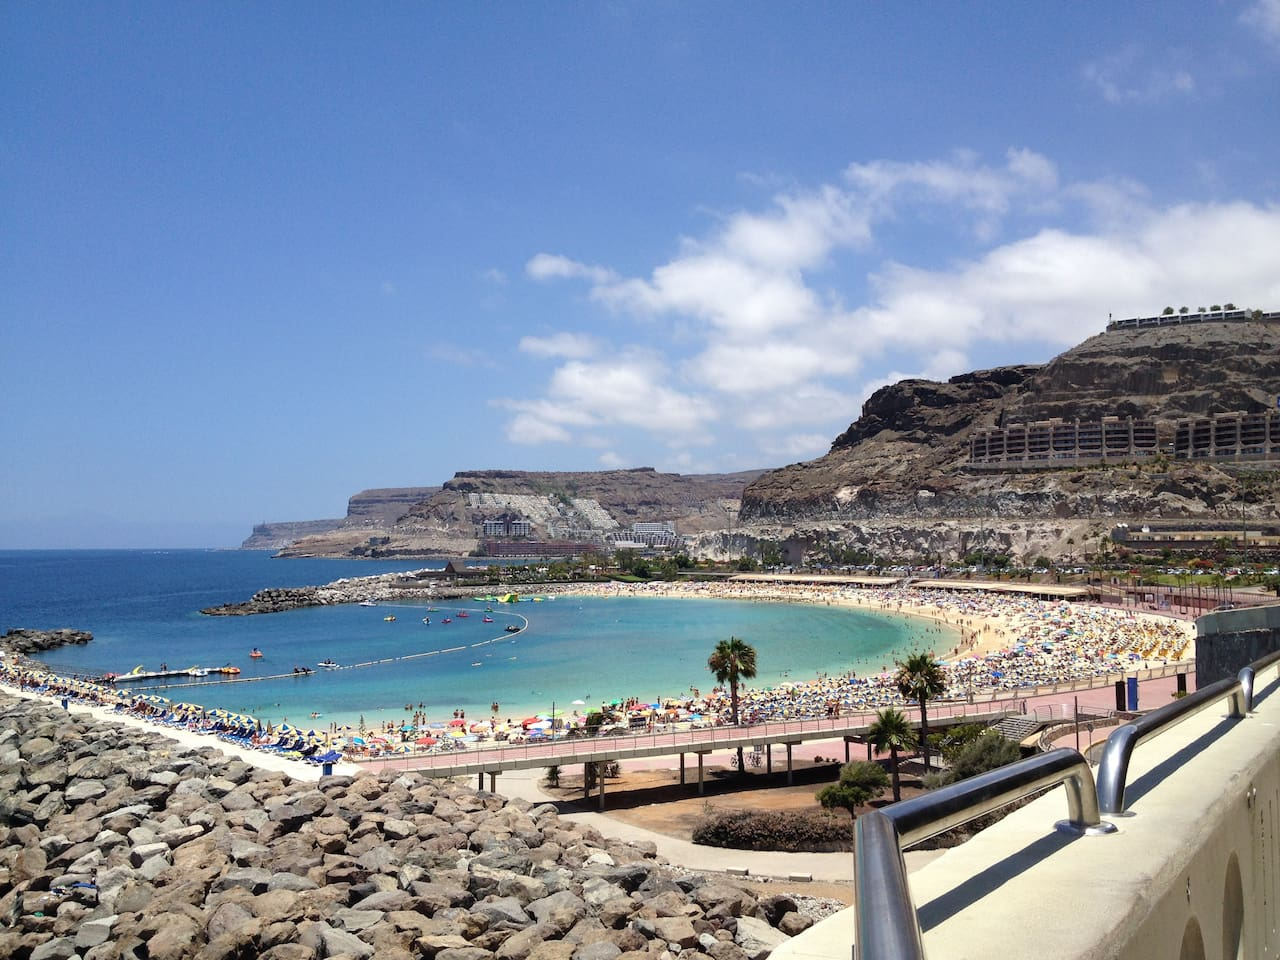 Beach - Playa de Amadores